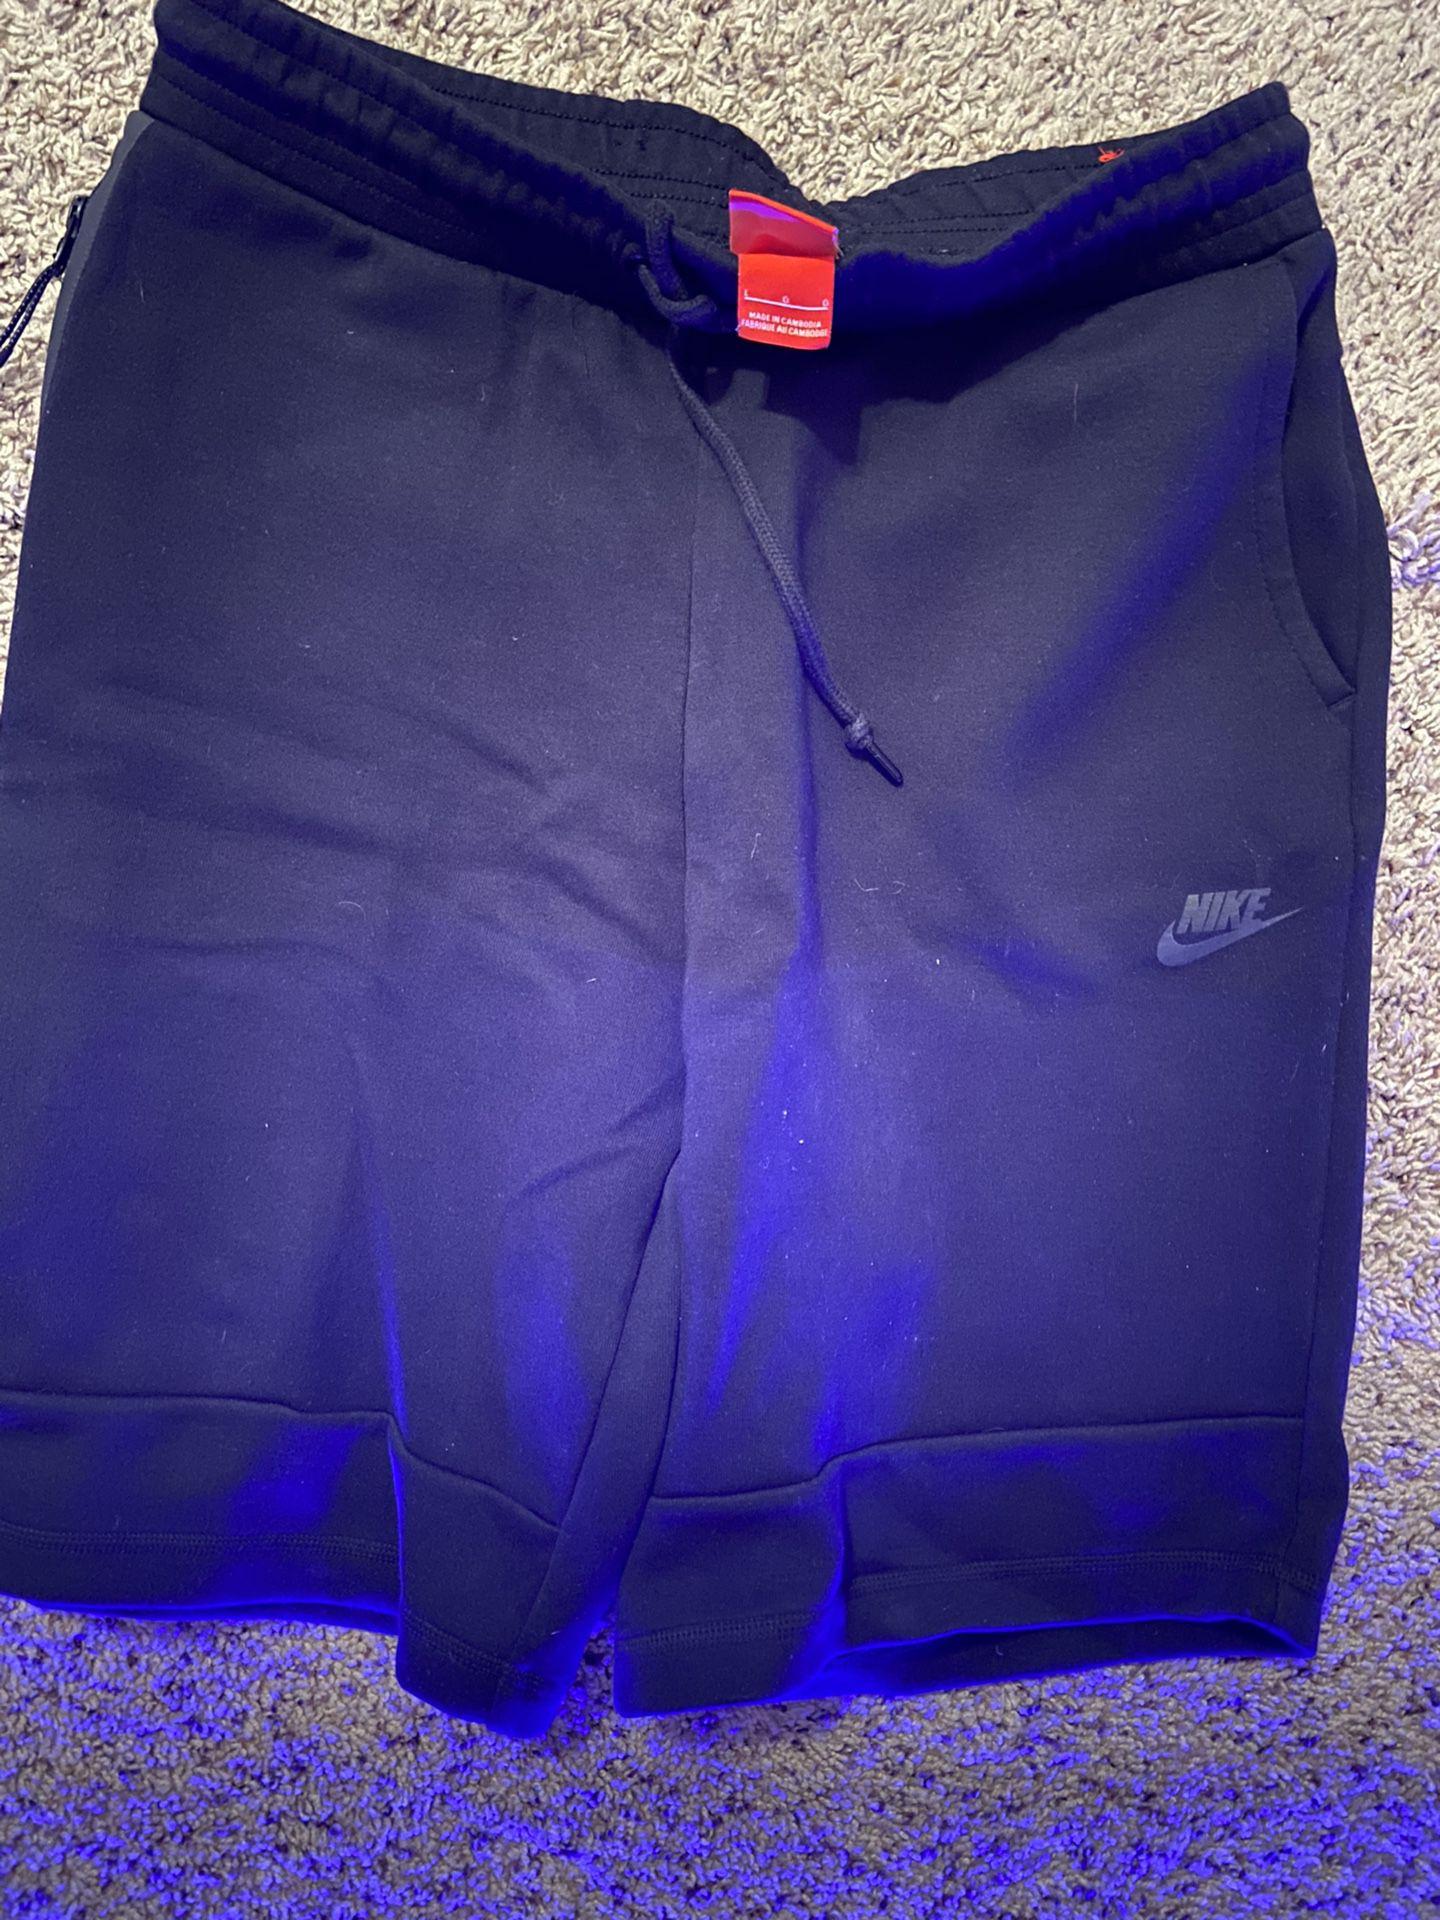 Size L brand new nike shorts